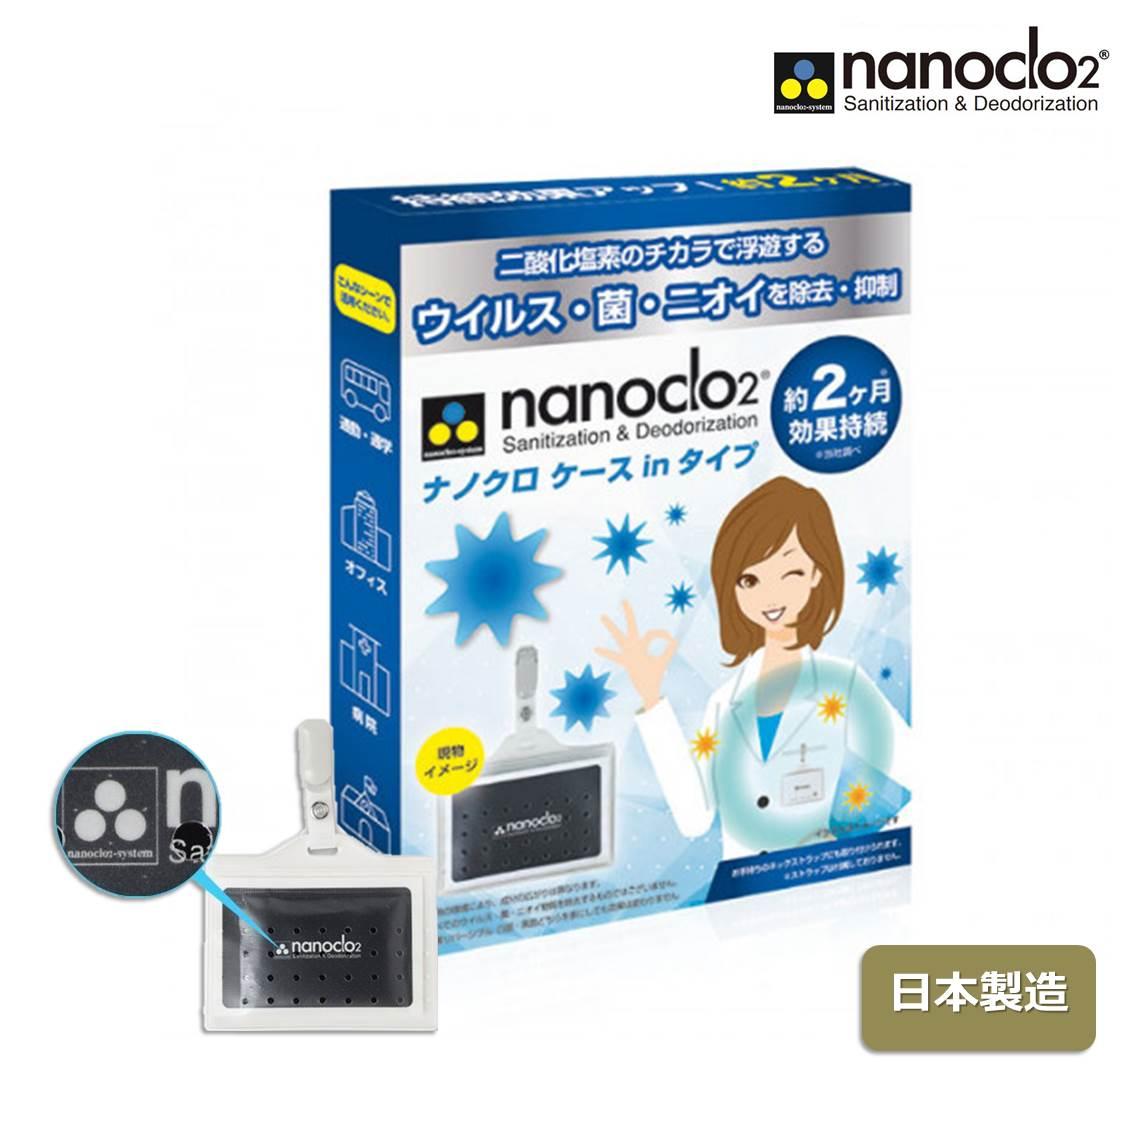 Nanoclo2流動抗菌包‧日本專利產品